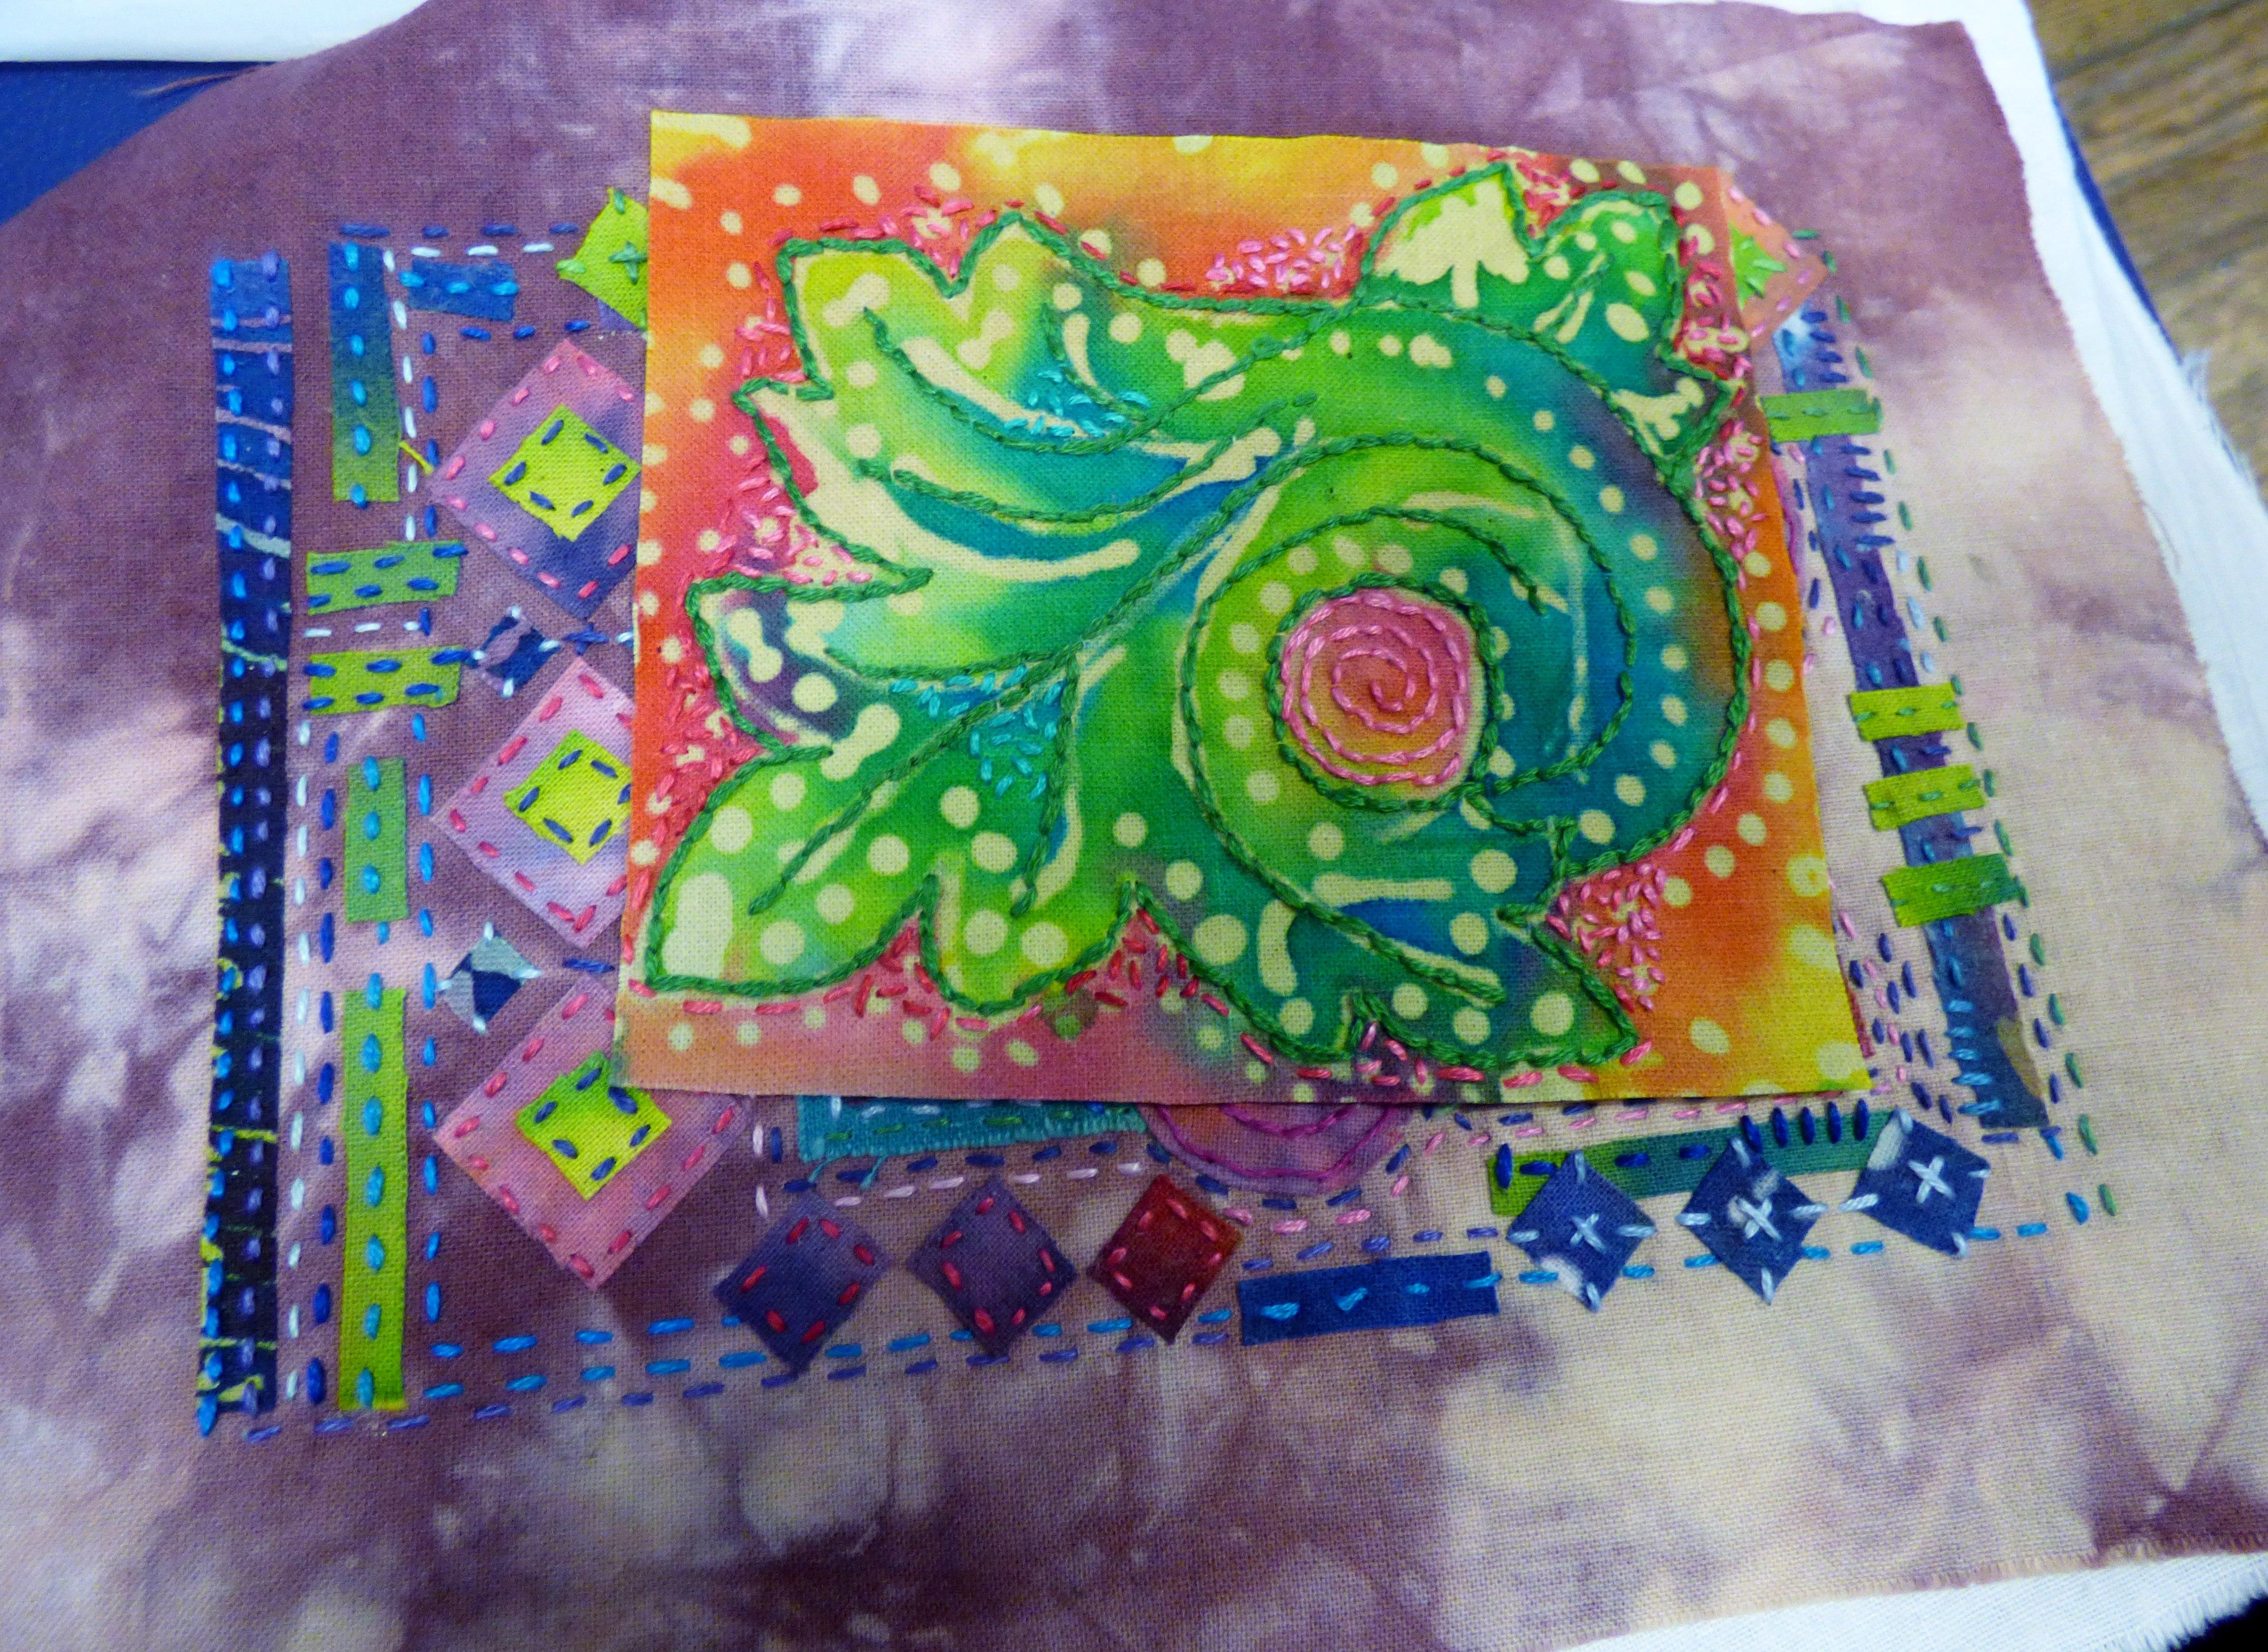 embroidered sample by Barbara Ryall, Bolton EG 2018